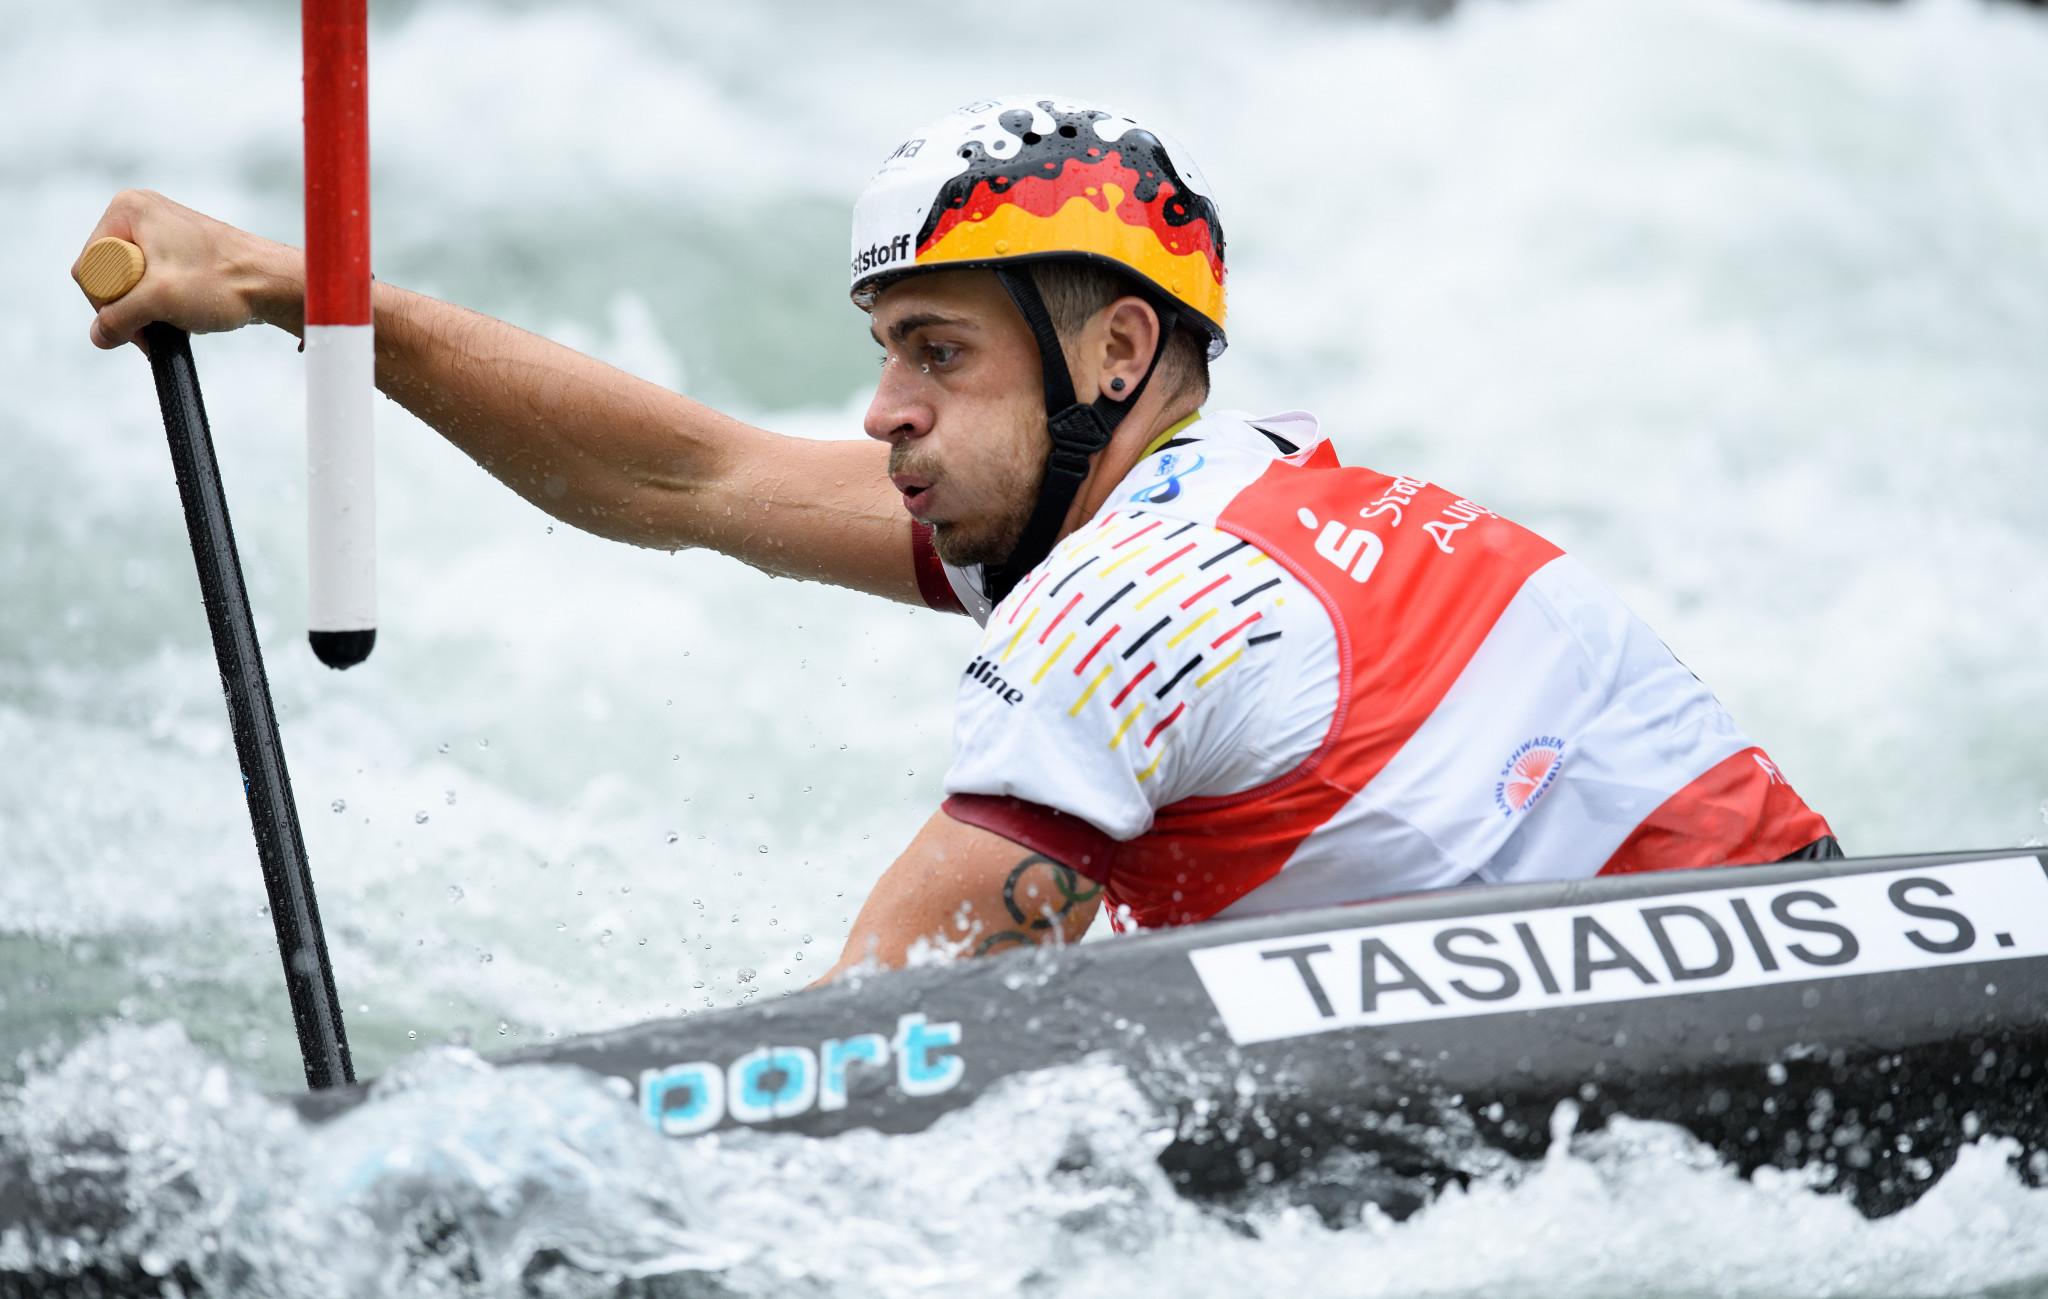 Tasiadis among C1 qualifiers as Canoe Slalom European Championships begin in Prague